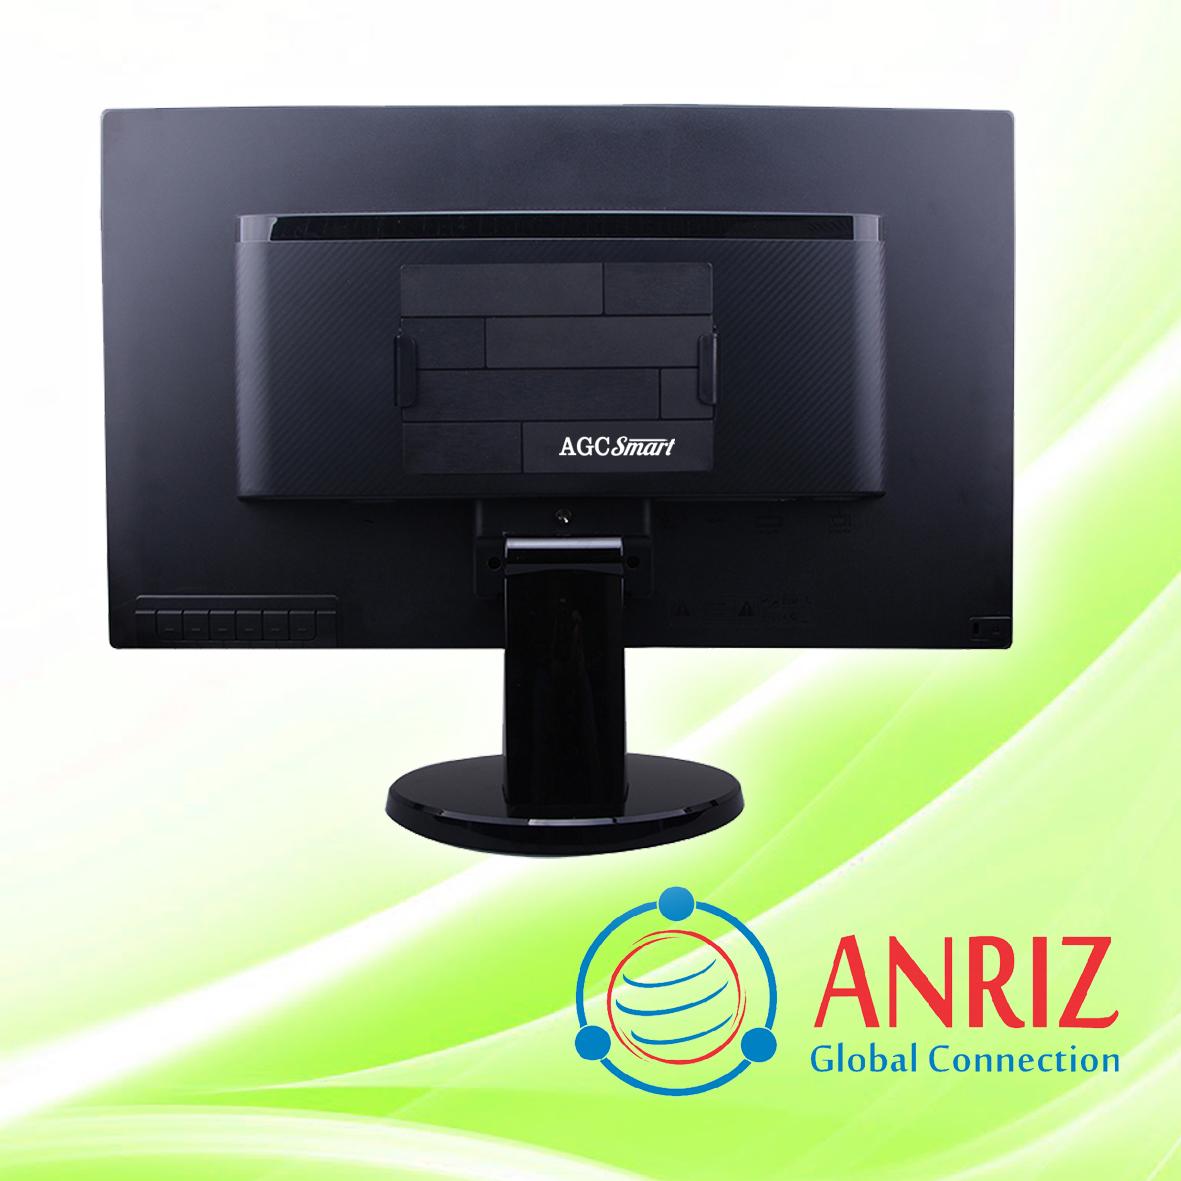 agc600l-atas (4)